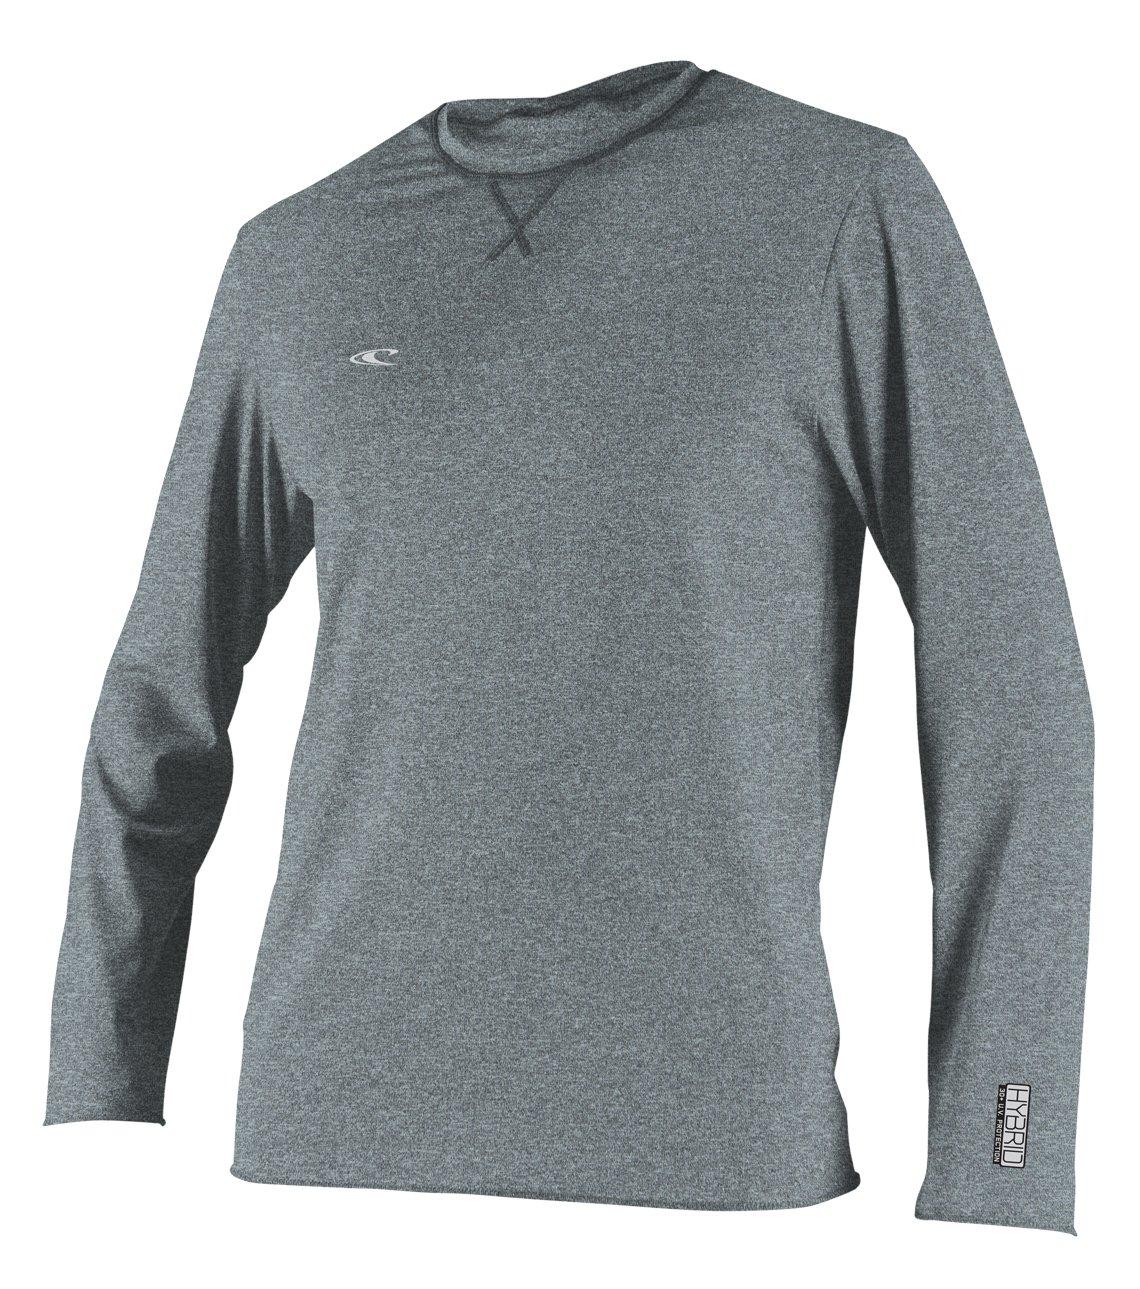 O'Neill  Men's Hybrid UPF 50+ Long Sleeve Sun Shirt, Cool Grey, Small by O'Neill Wetsuits